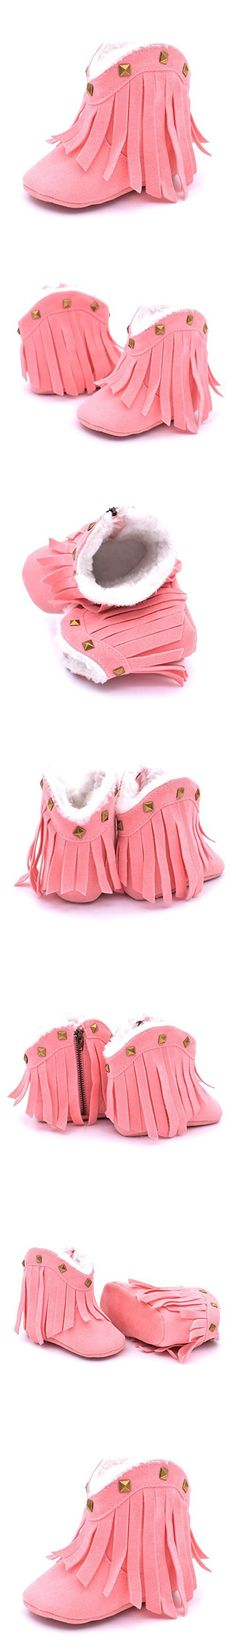 Gotd Toddler Baby Girl Tassel Rivet Snow Boots Winter Warm Shoes (S: 0~6 Months, Pink)